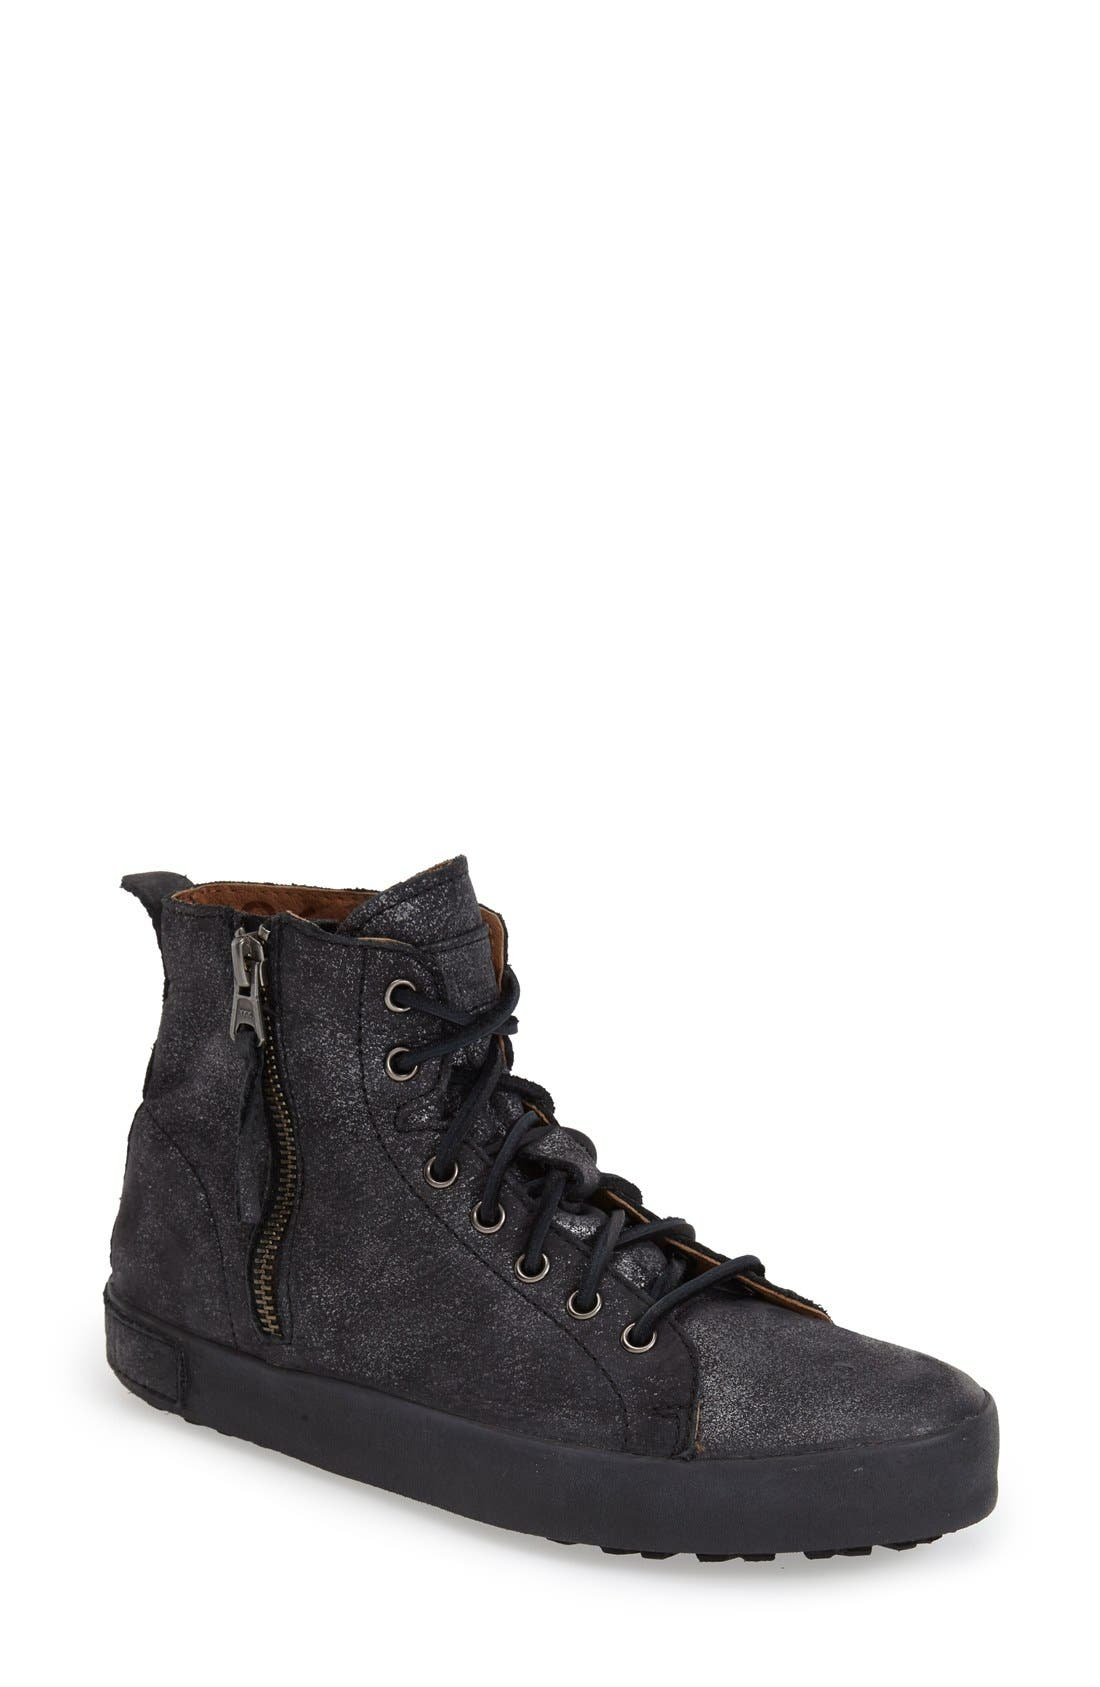 'JL' High Top Sneaker,                             Main thumbnail 1, color,                             Black Metallic